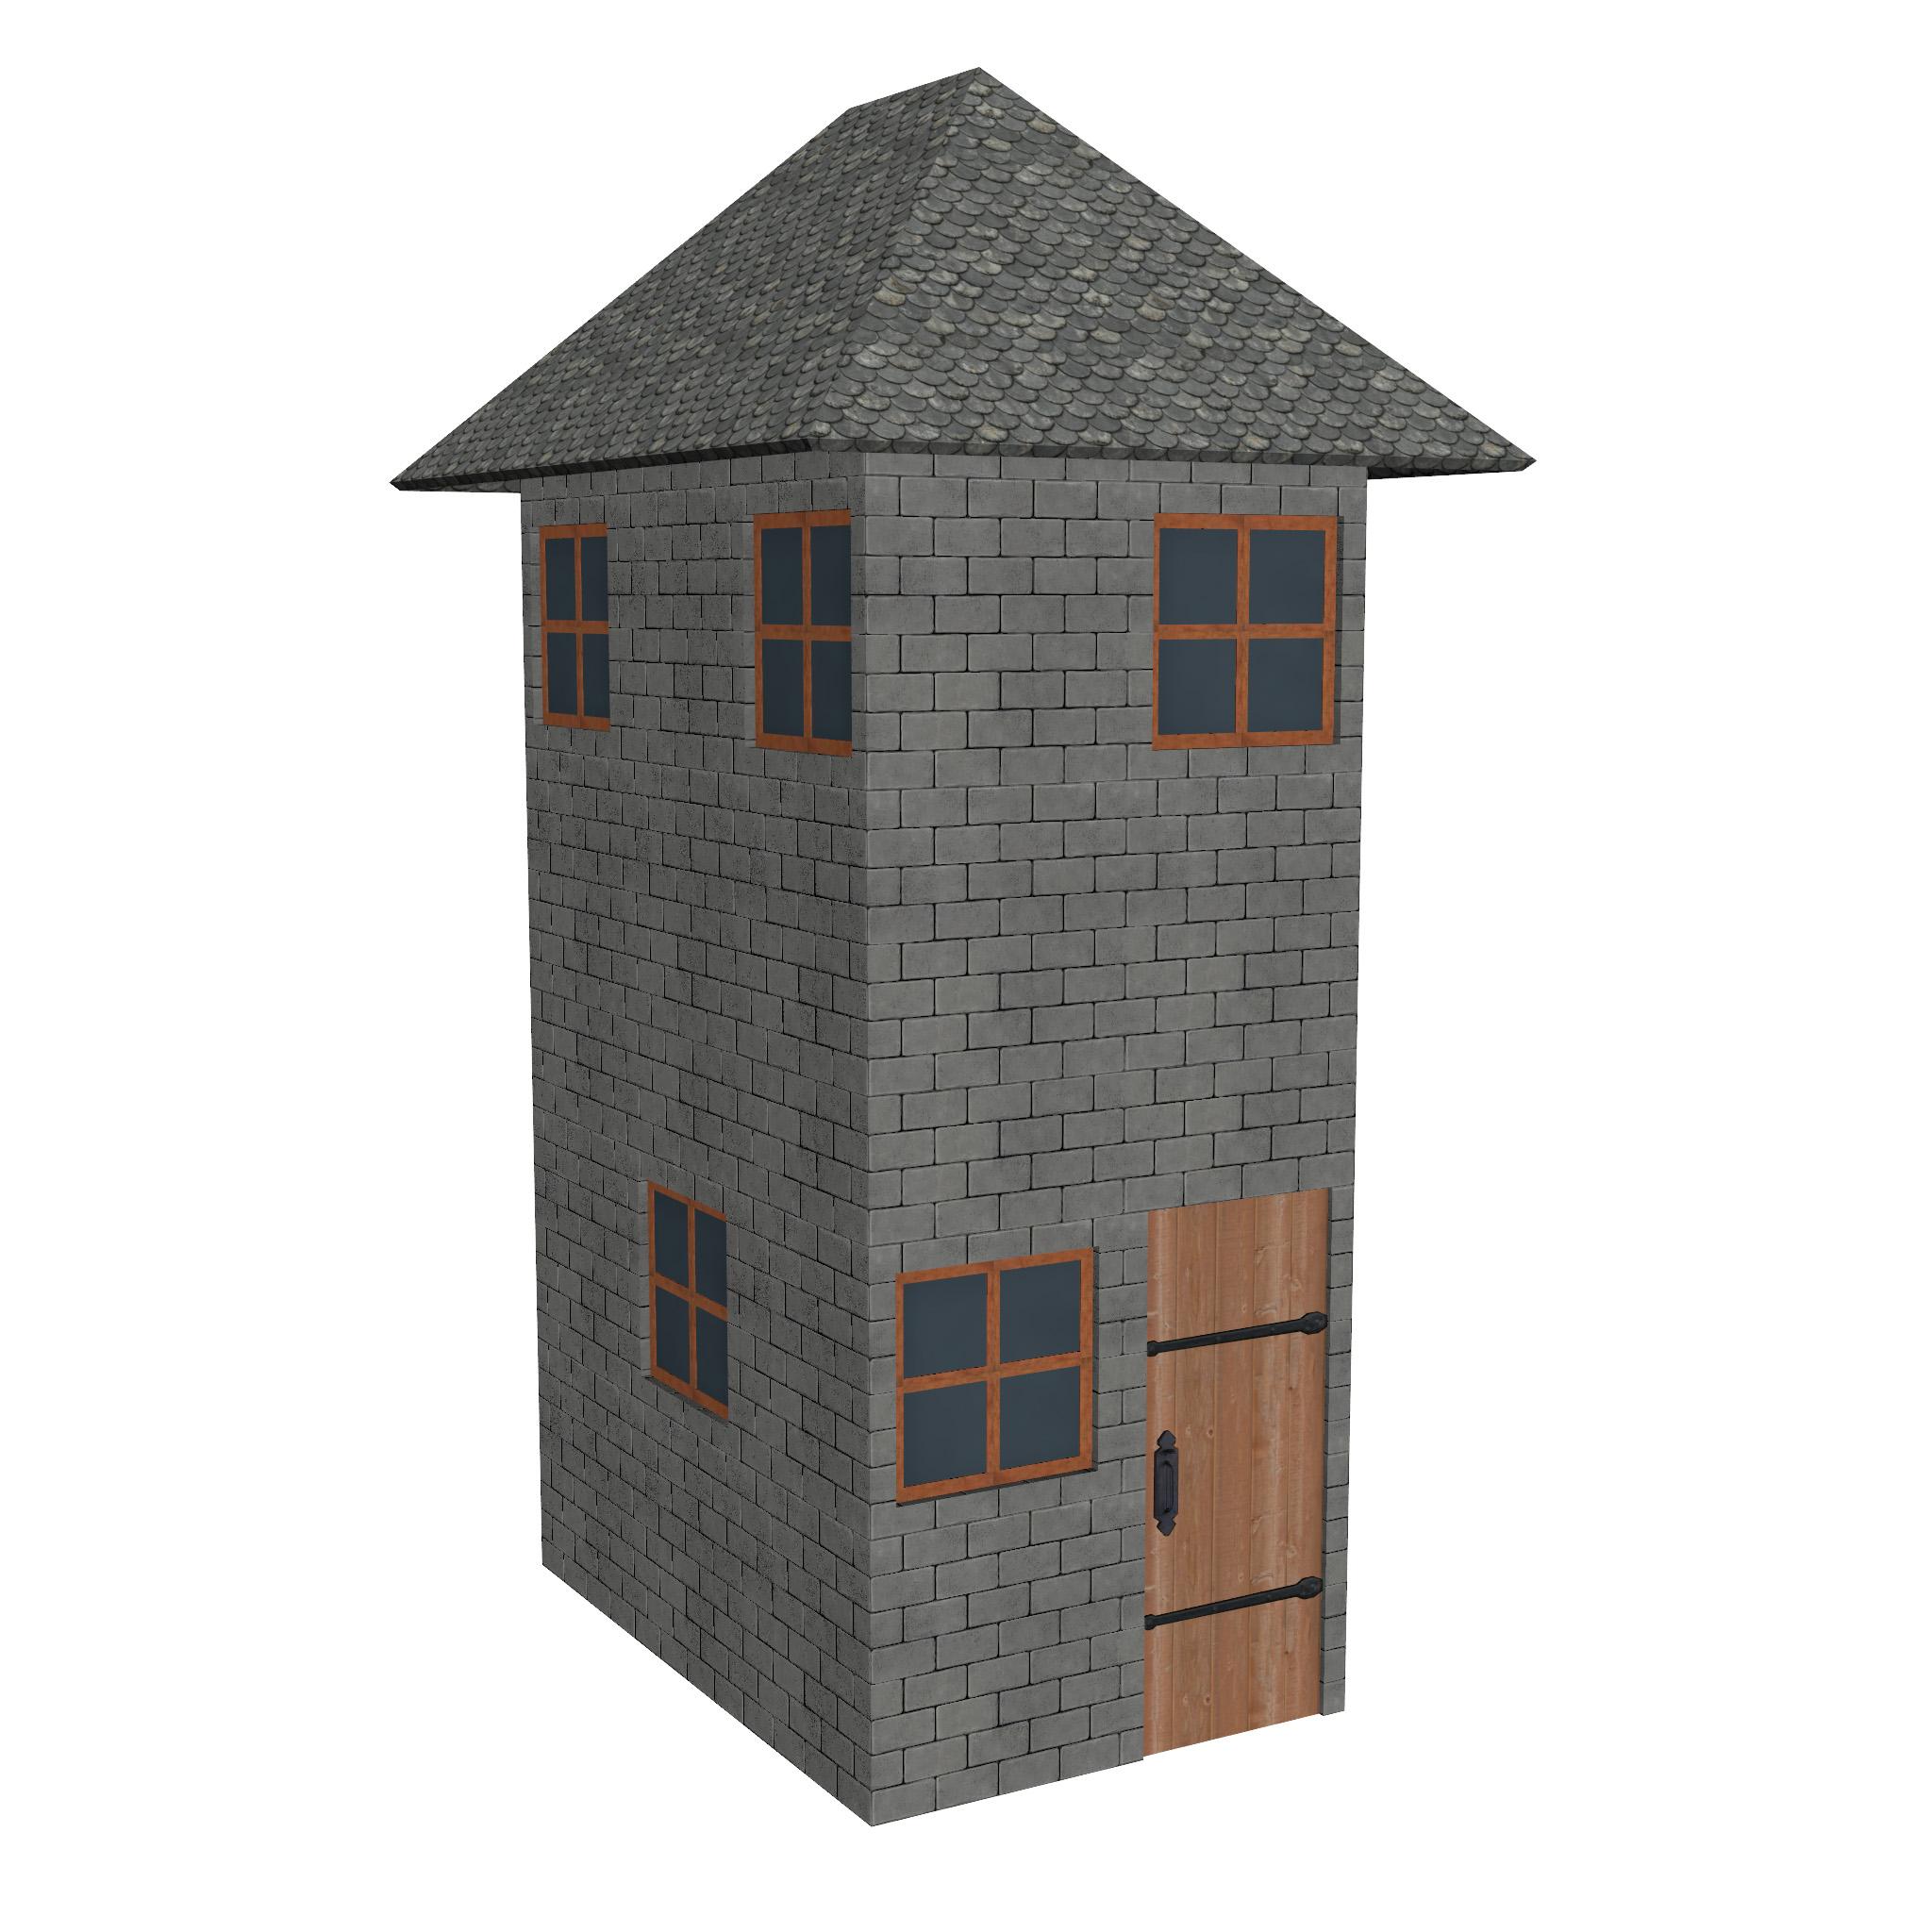 modular brick house set 3d model fbx ma mb 271402